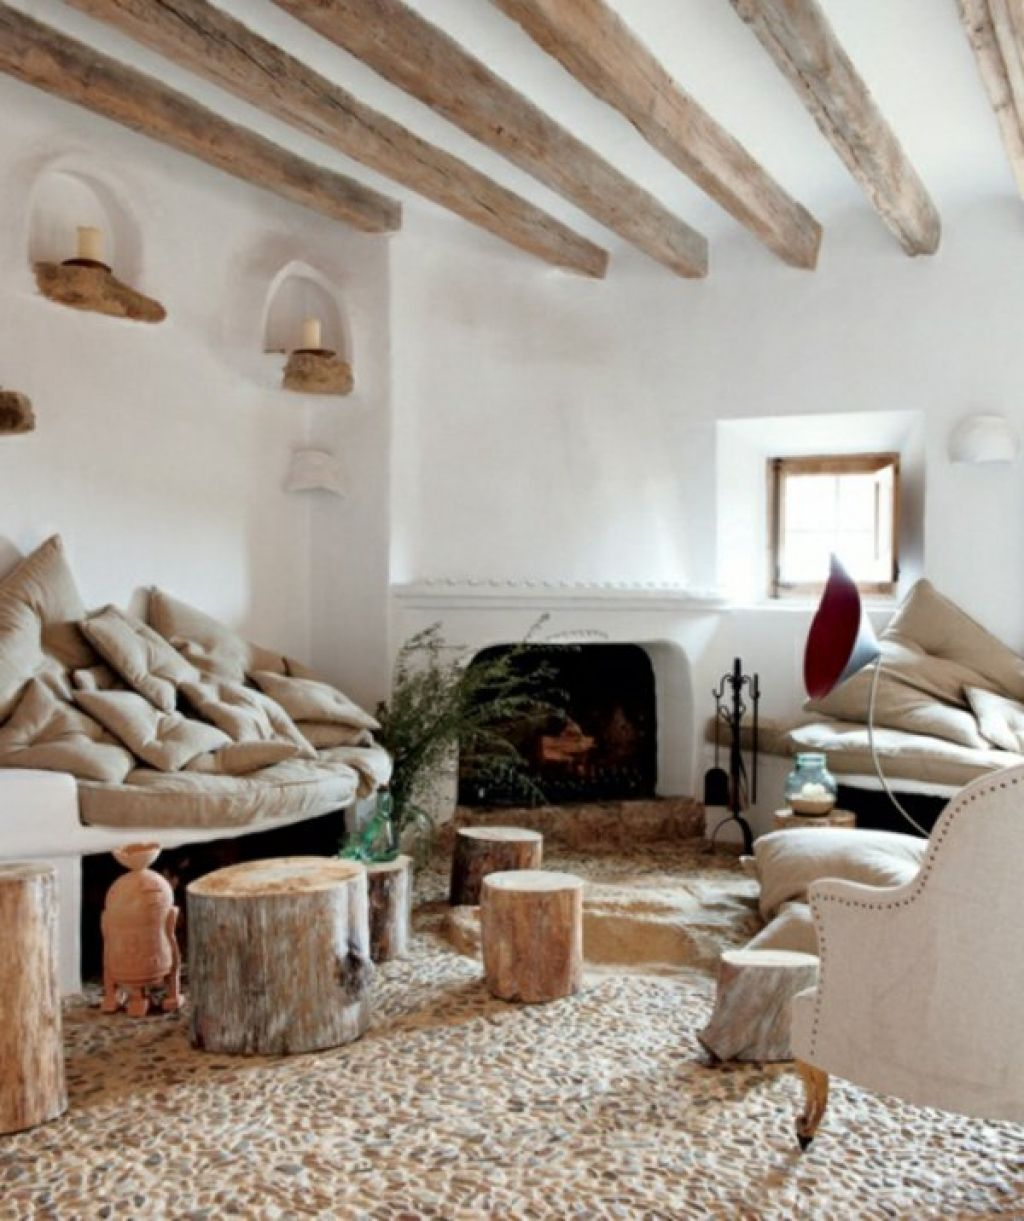 21 Kreative Deko Ideen Aus Baumstumpf Selber Machen Deko Ideen Wohnzimmer Selber Machen Rustikale Innenräume Rustikales Haus Haus Deko